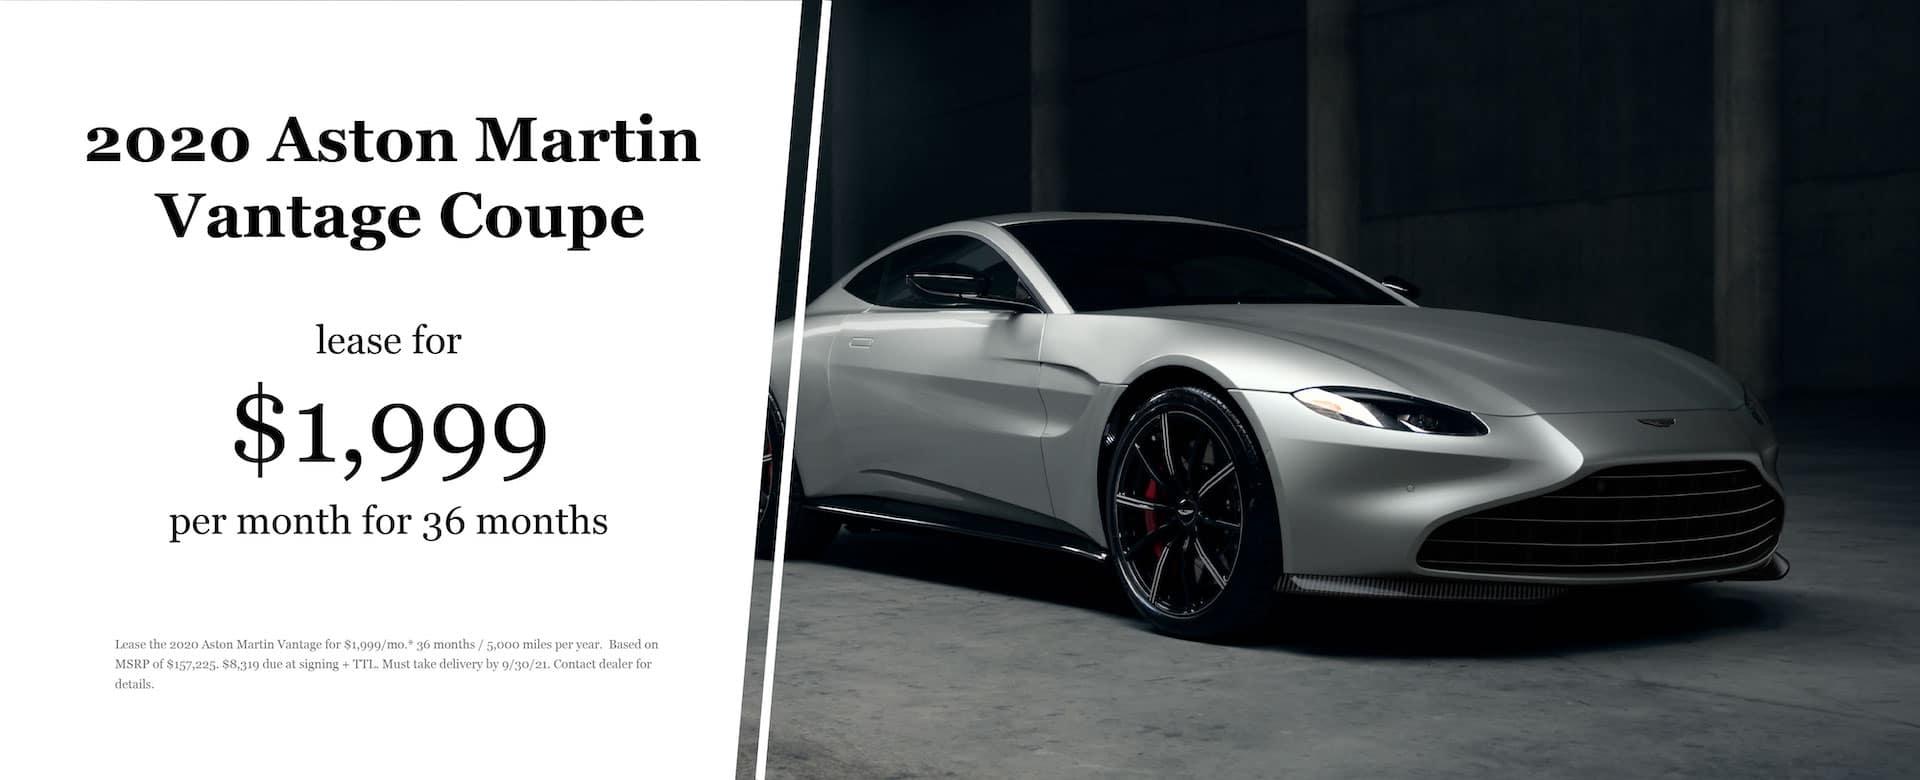 2021 Aston Martin Vantage Lease Offer